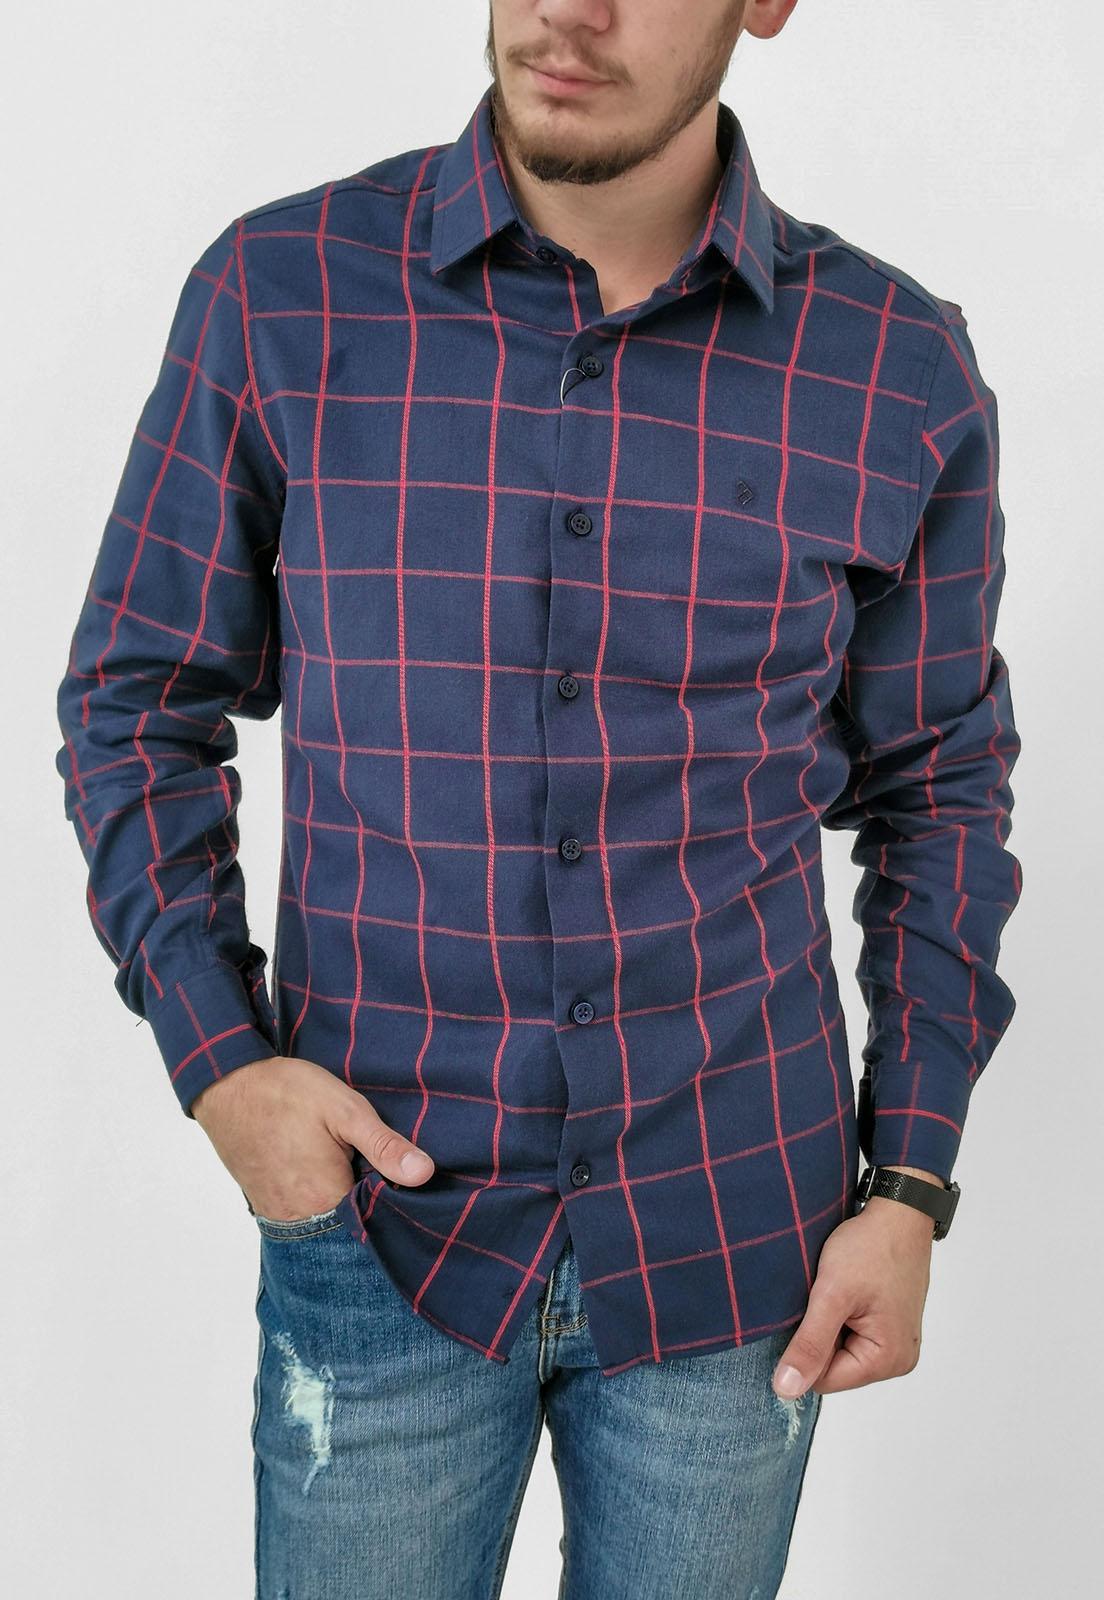 Camisa Pitt Slim Xadrez Azul Marinho Flanelada